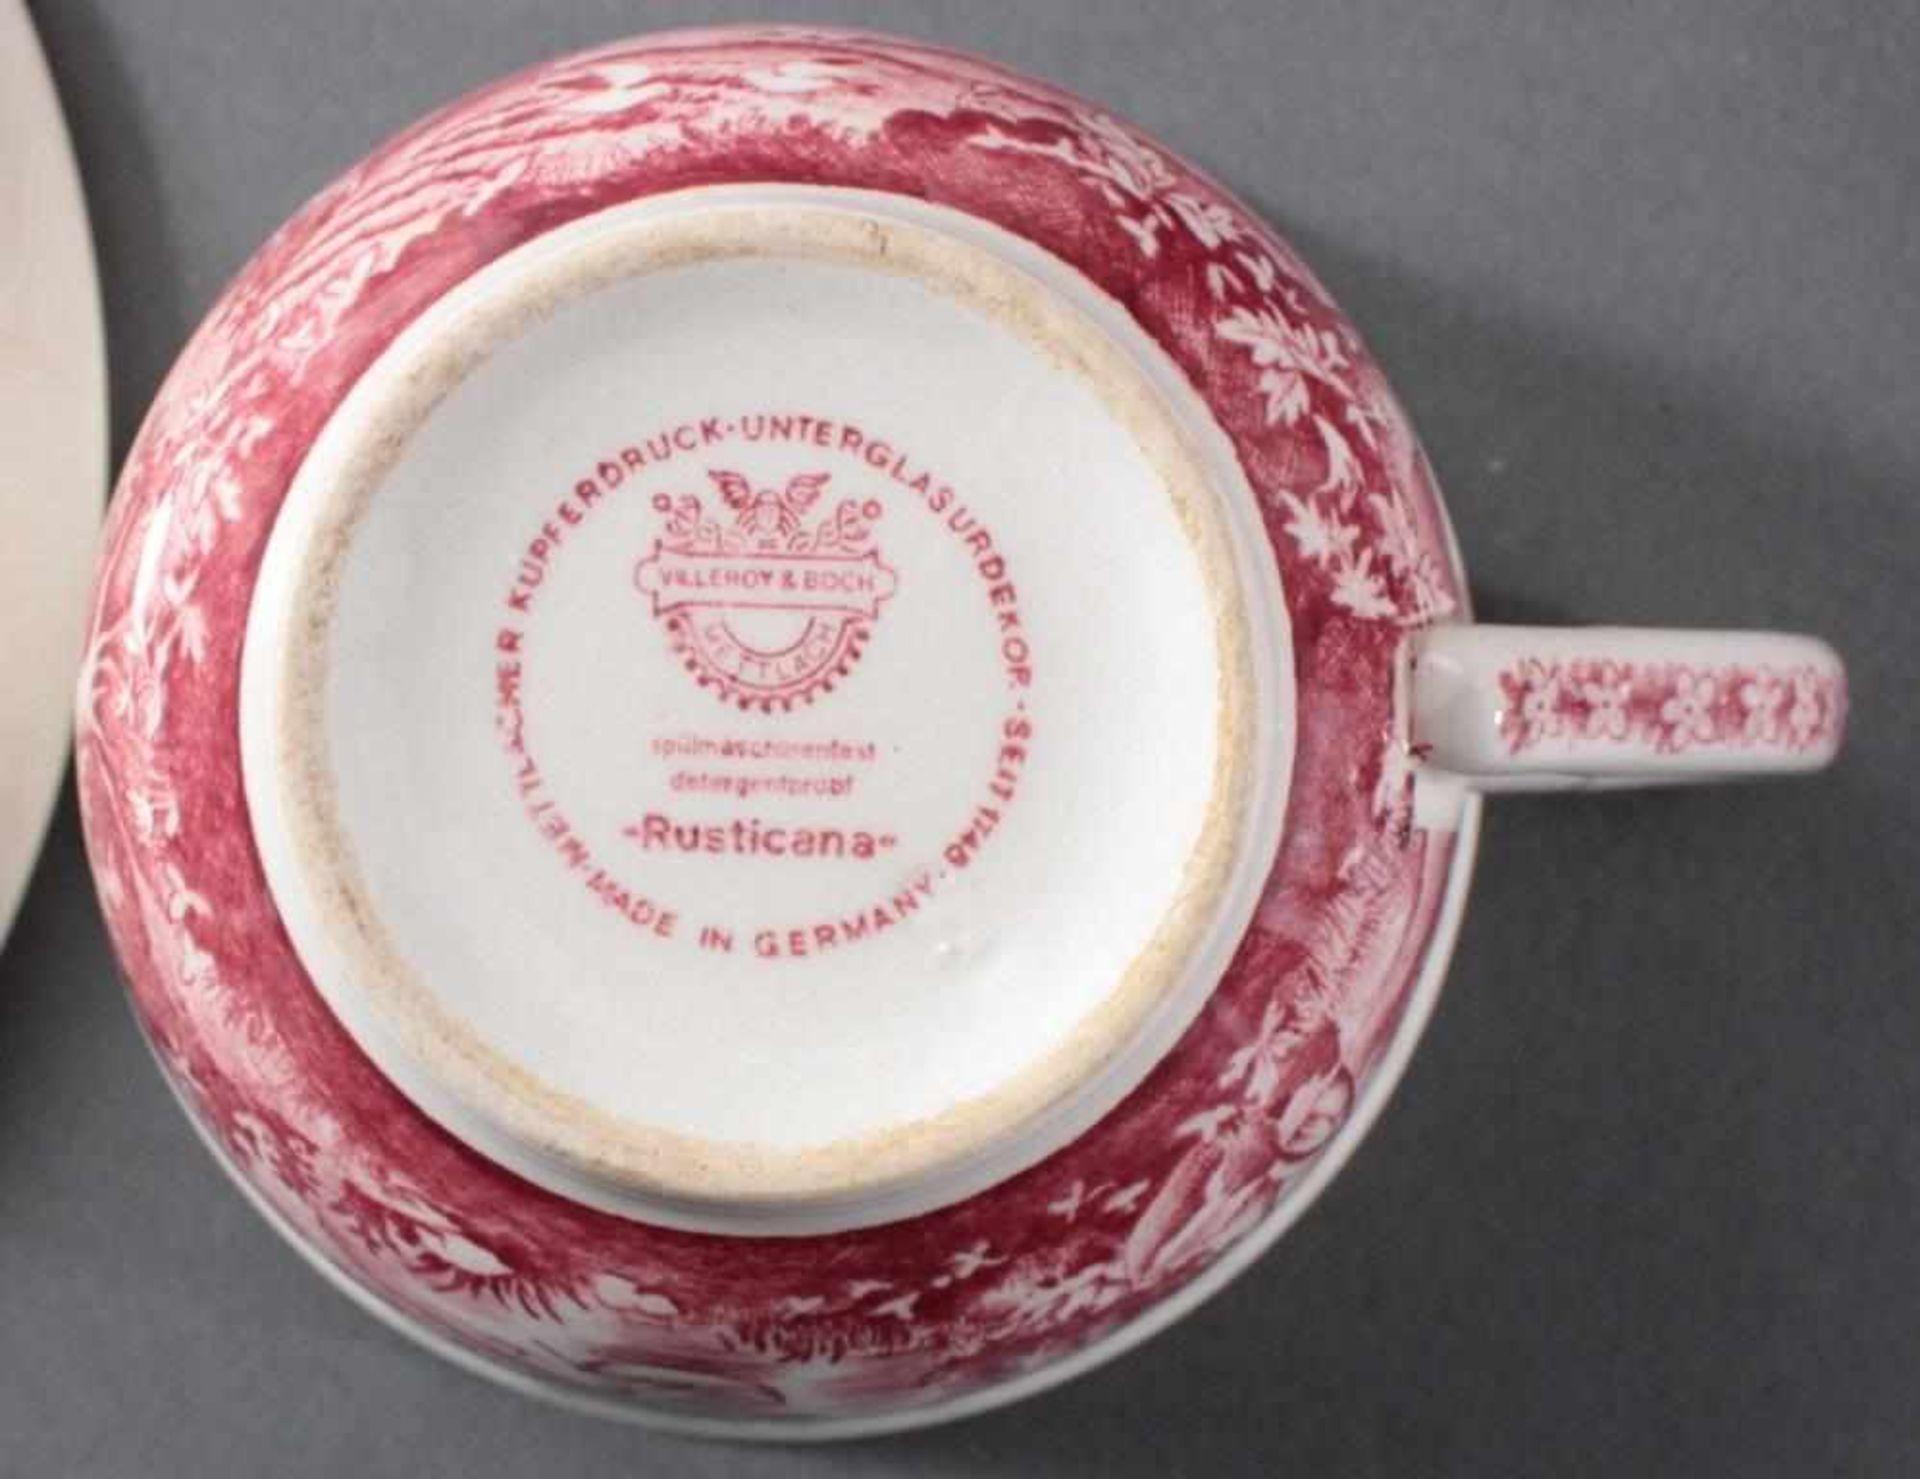 Villeroy & Boch Kaffee-/Speiseservice, Dekor Rusticana rot107 Teile. 1 Kaffeekanne, 13 Tassen, 12 - Bild 4 aus 4